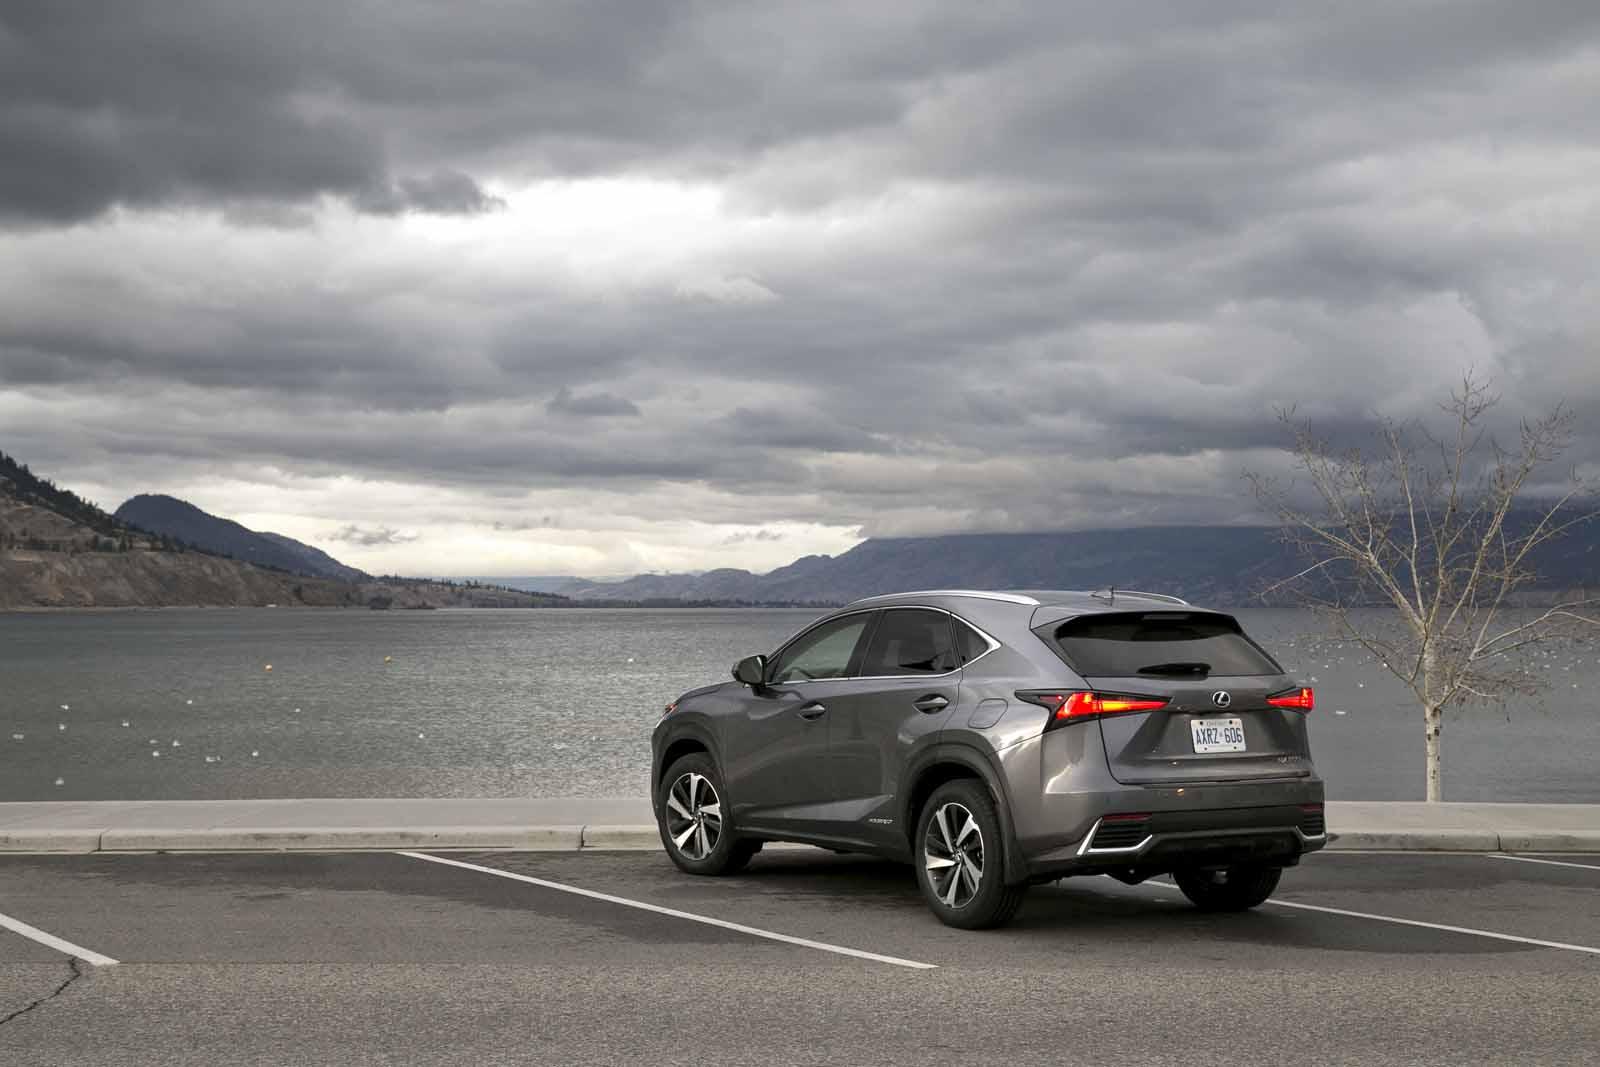 2018-Lexus-NX-Review-JEFF-WILSON-22.jpg